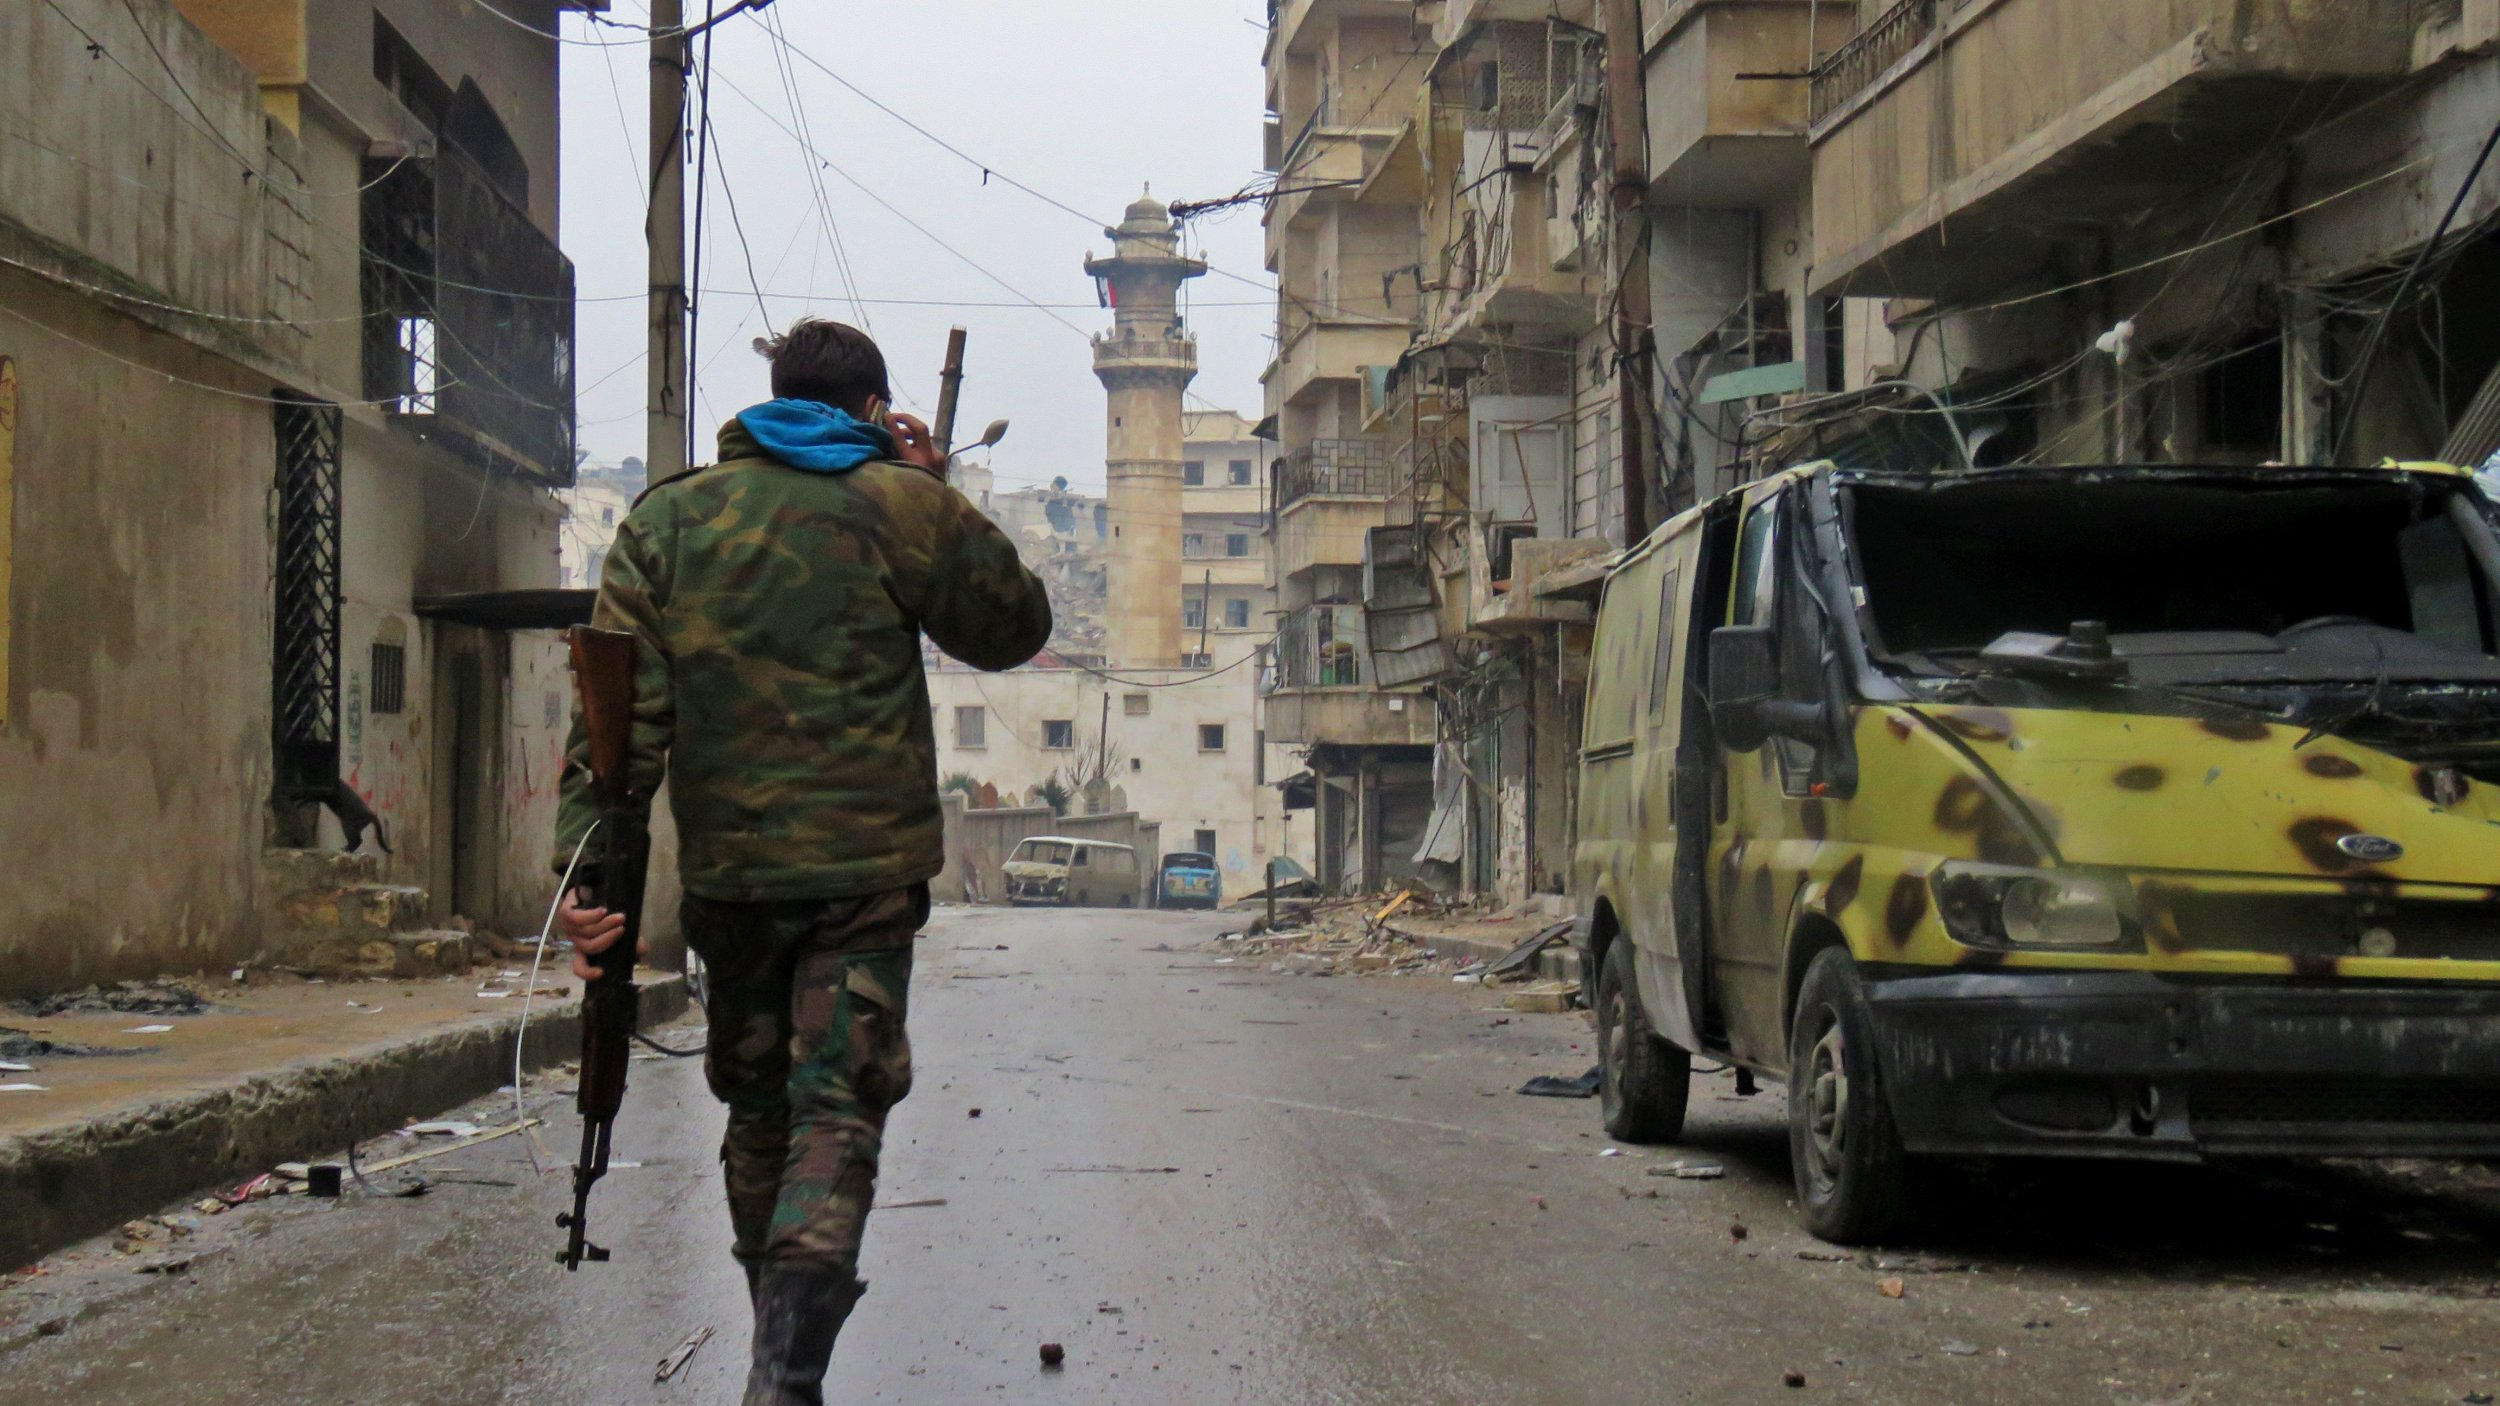 Syrian soldier walking in Aleppo